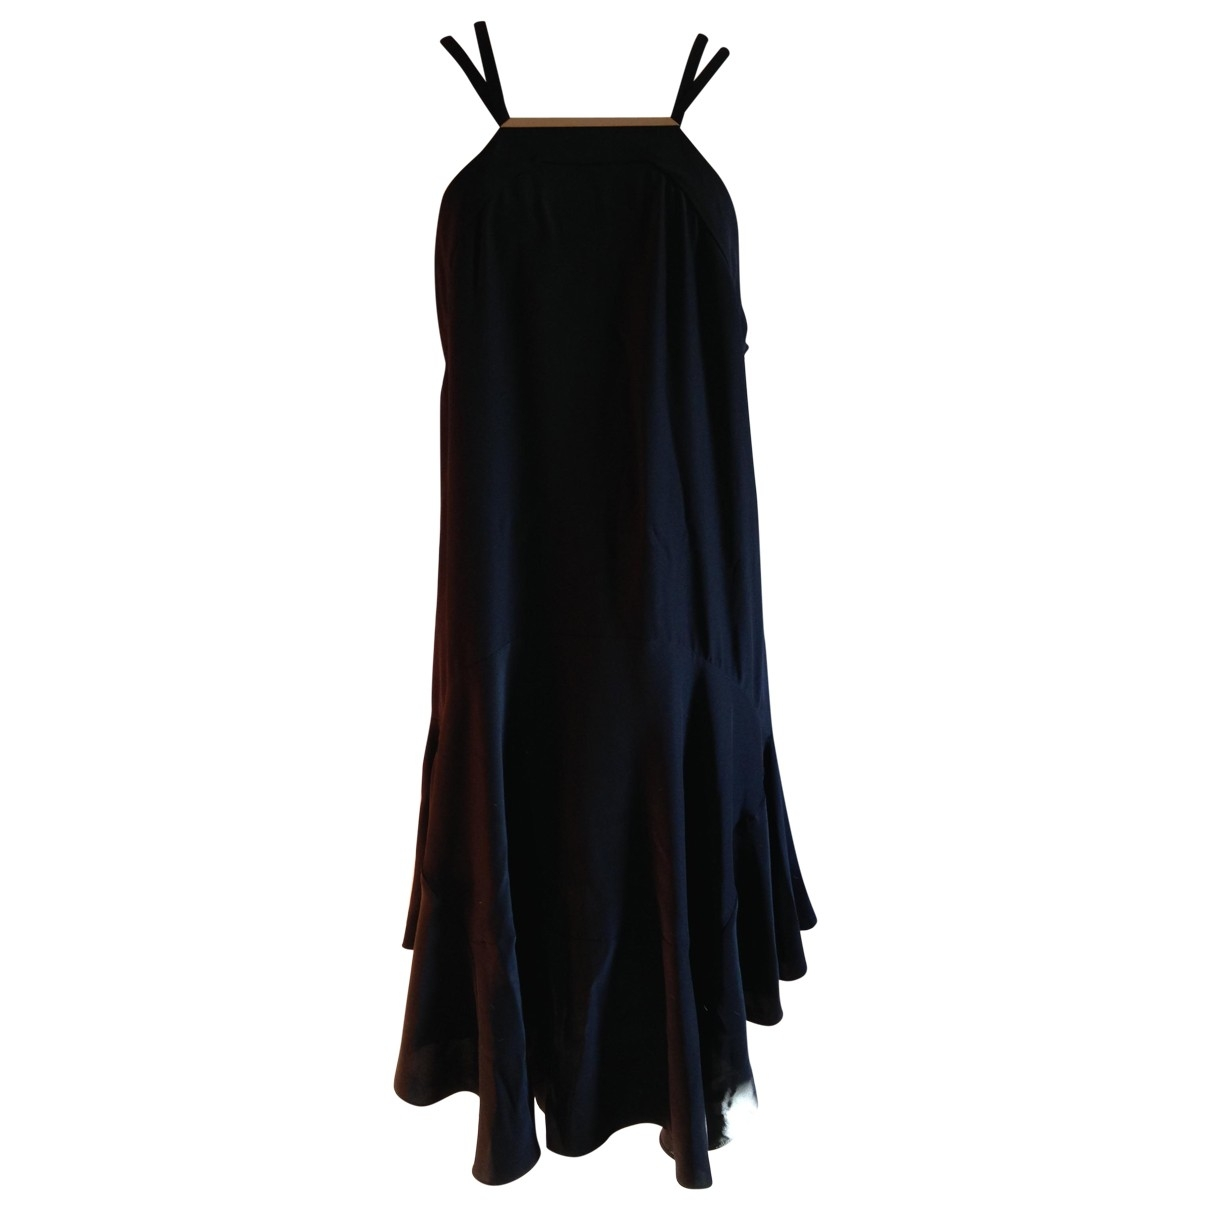 Barbara Bui - Robe   pour femme en soie - noir